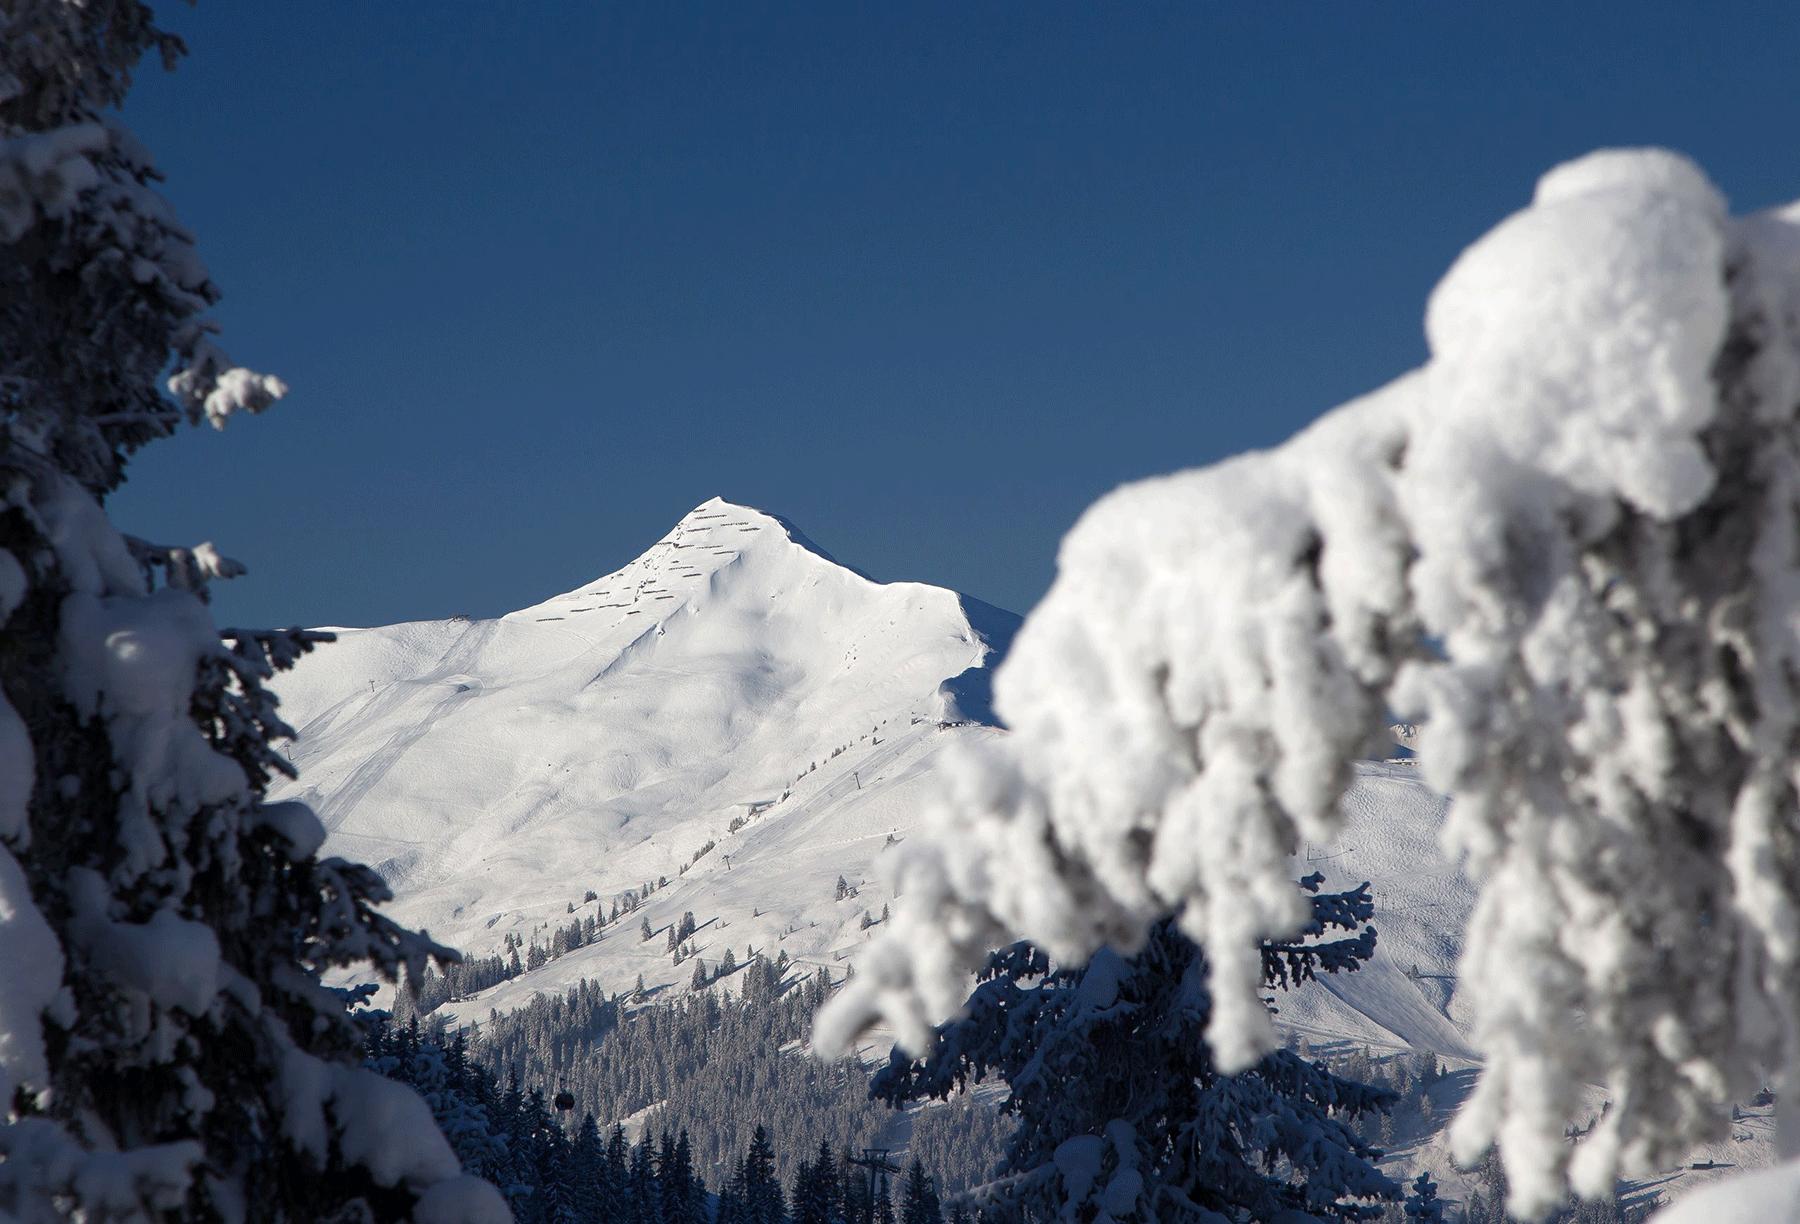 Skigebiet Ski Juwel im Alpbachtal für Aktivurlaub Kitzbüheler Alpen